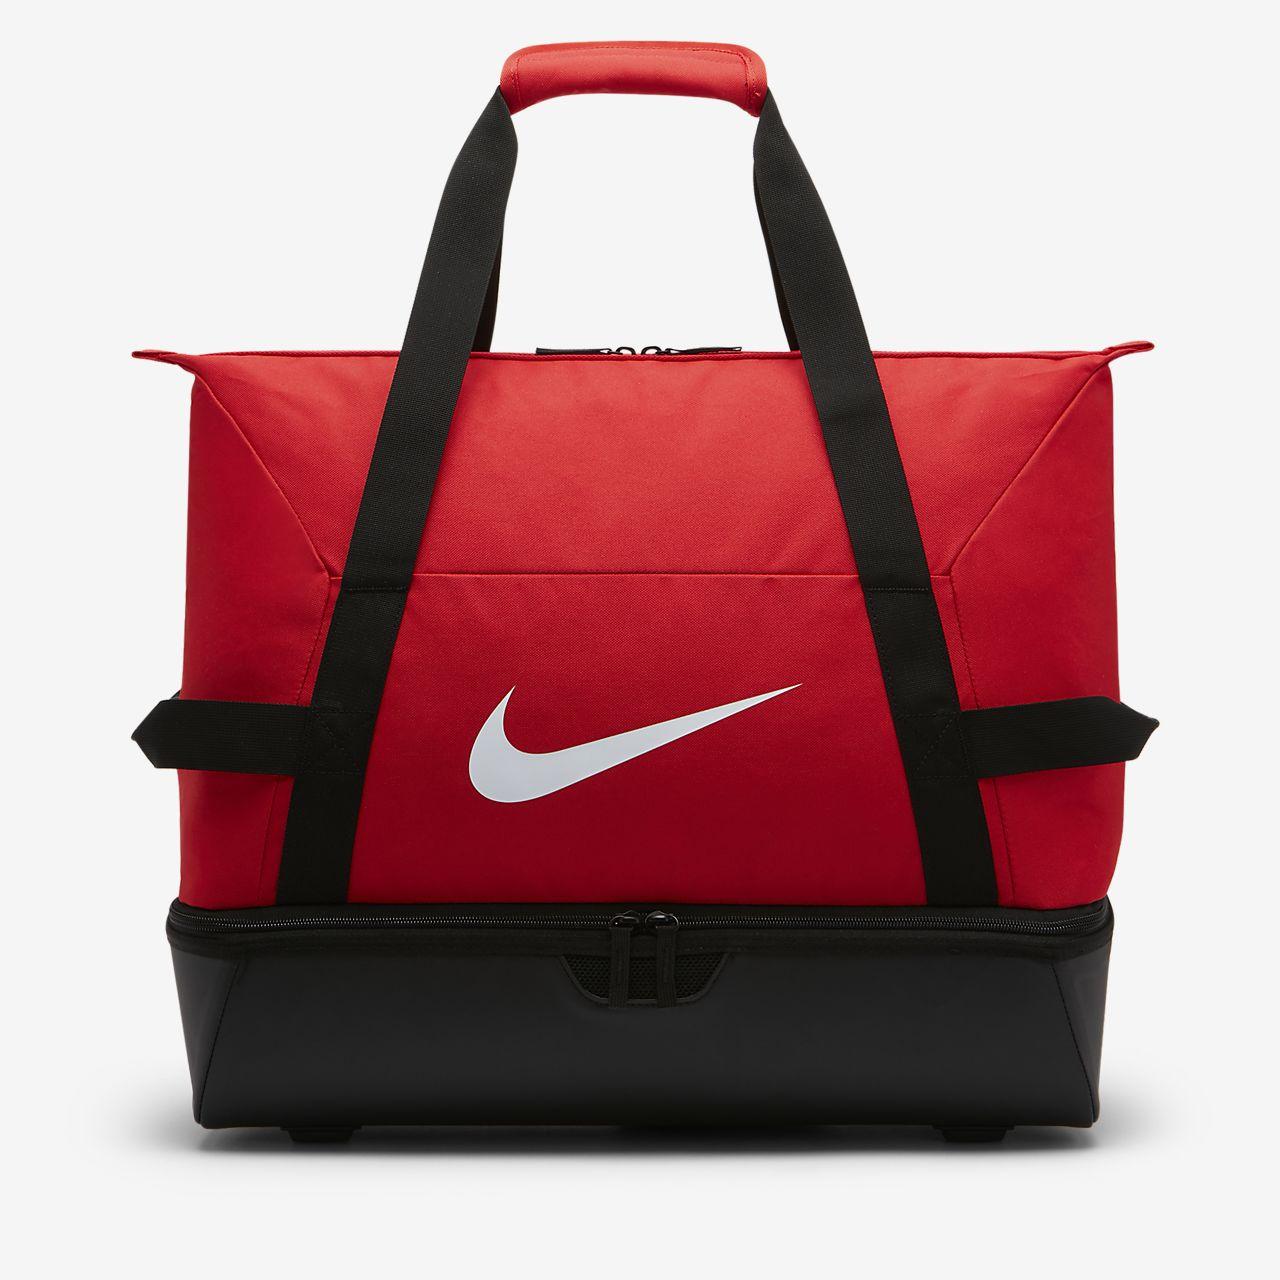 Stor fotbollsväska Nike Academy Team Hardcase